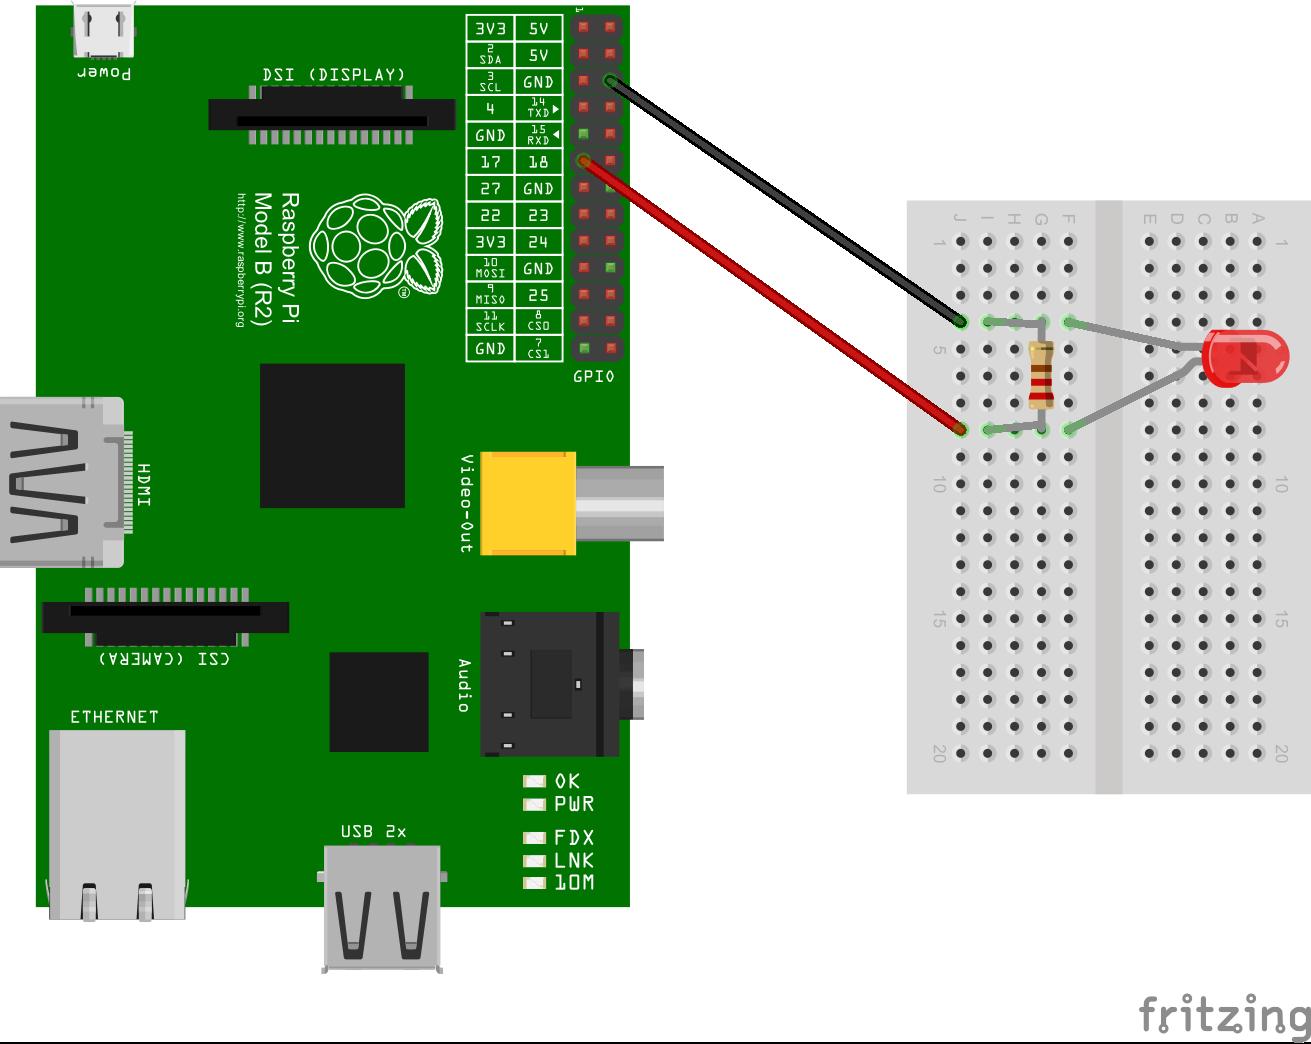 Wiringpi Led Raspberry Manual Guide Wiring Diagram Visualgdb Raspberrypi Pi U3092wiringpi U3068johnny Five U306eraspi Io U3092 B Gpio Pinout Python